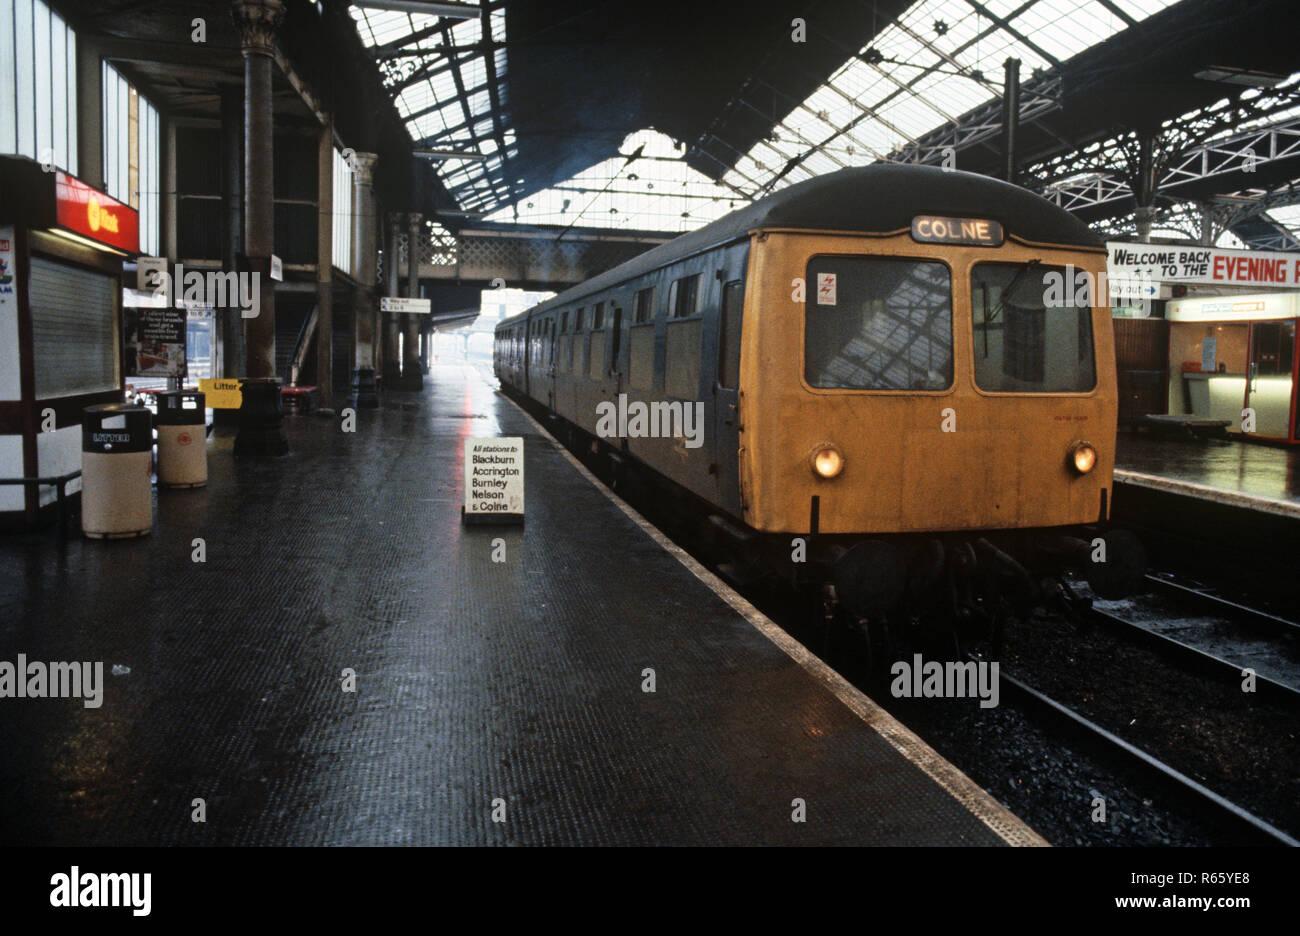 Diesel Multiple Unit at Preston station on the Preston to Colne railway line, Lancashire, Great Britain - Stock Image